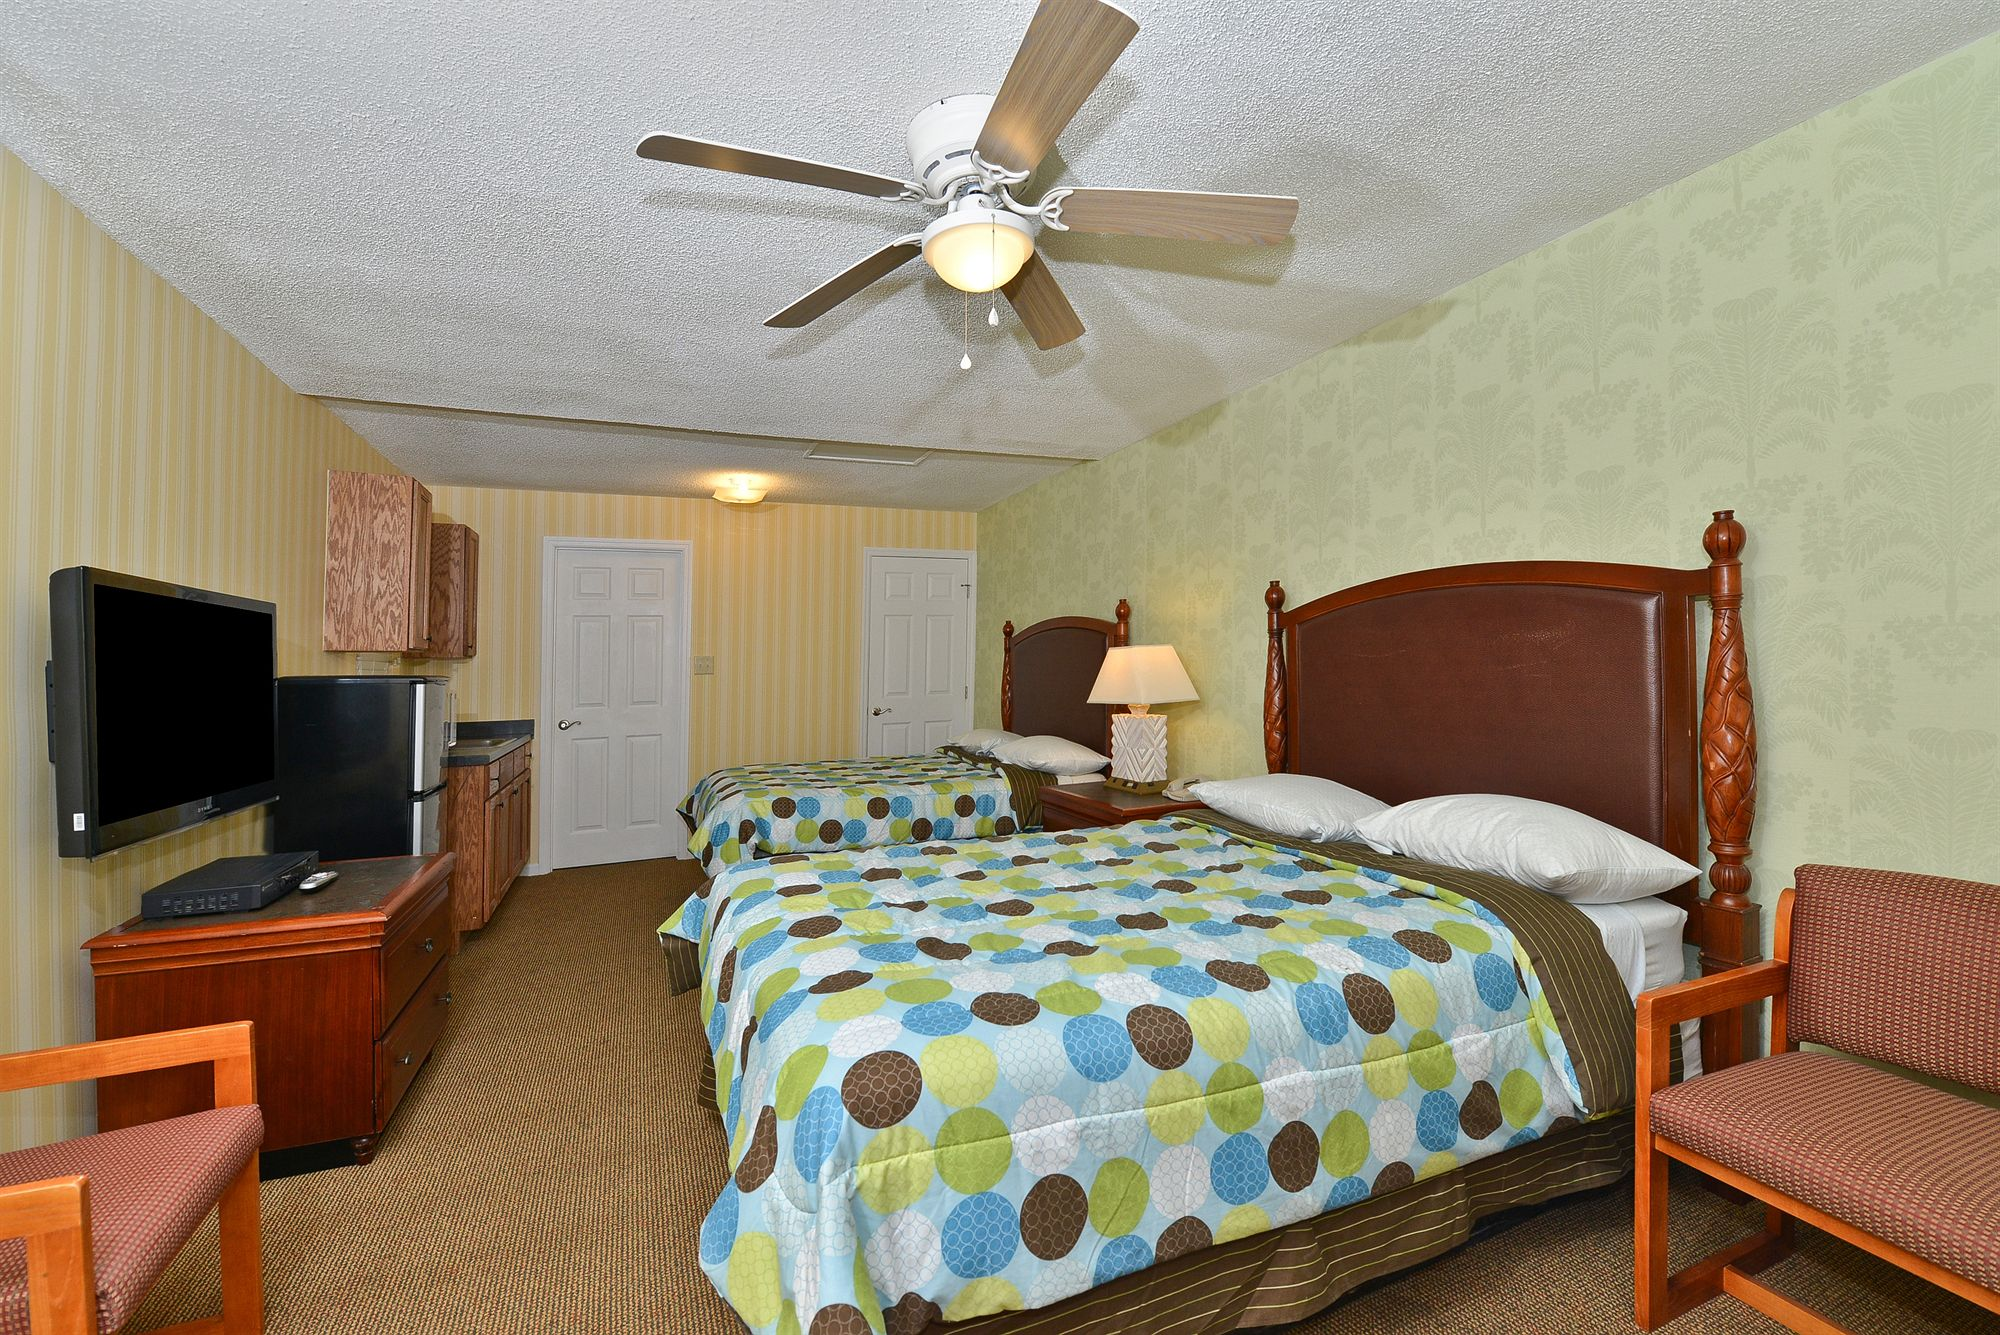 American Inn and Suites in Garden City, GA